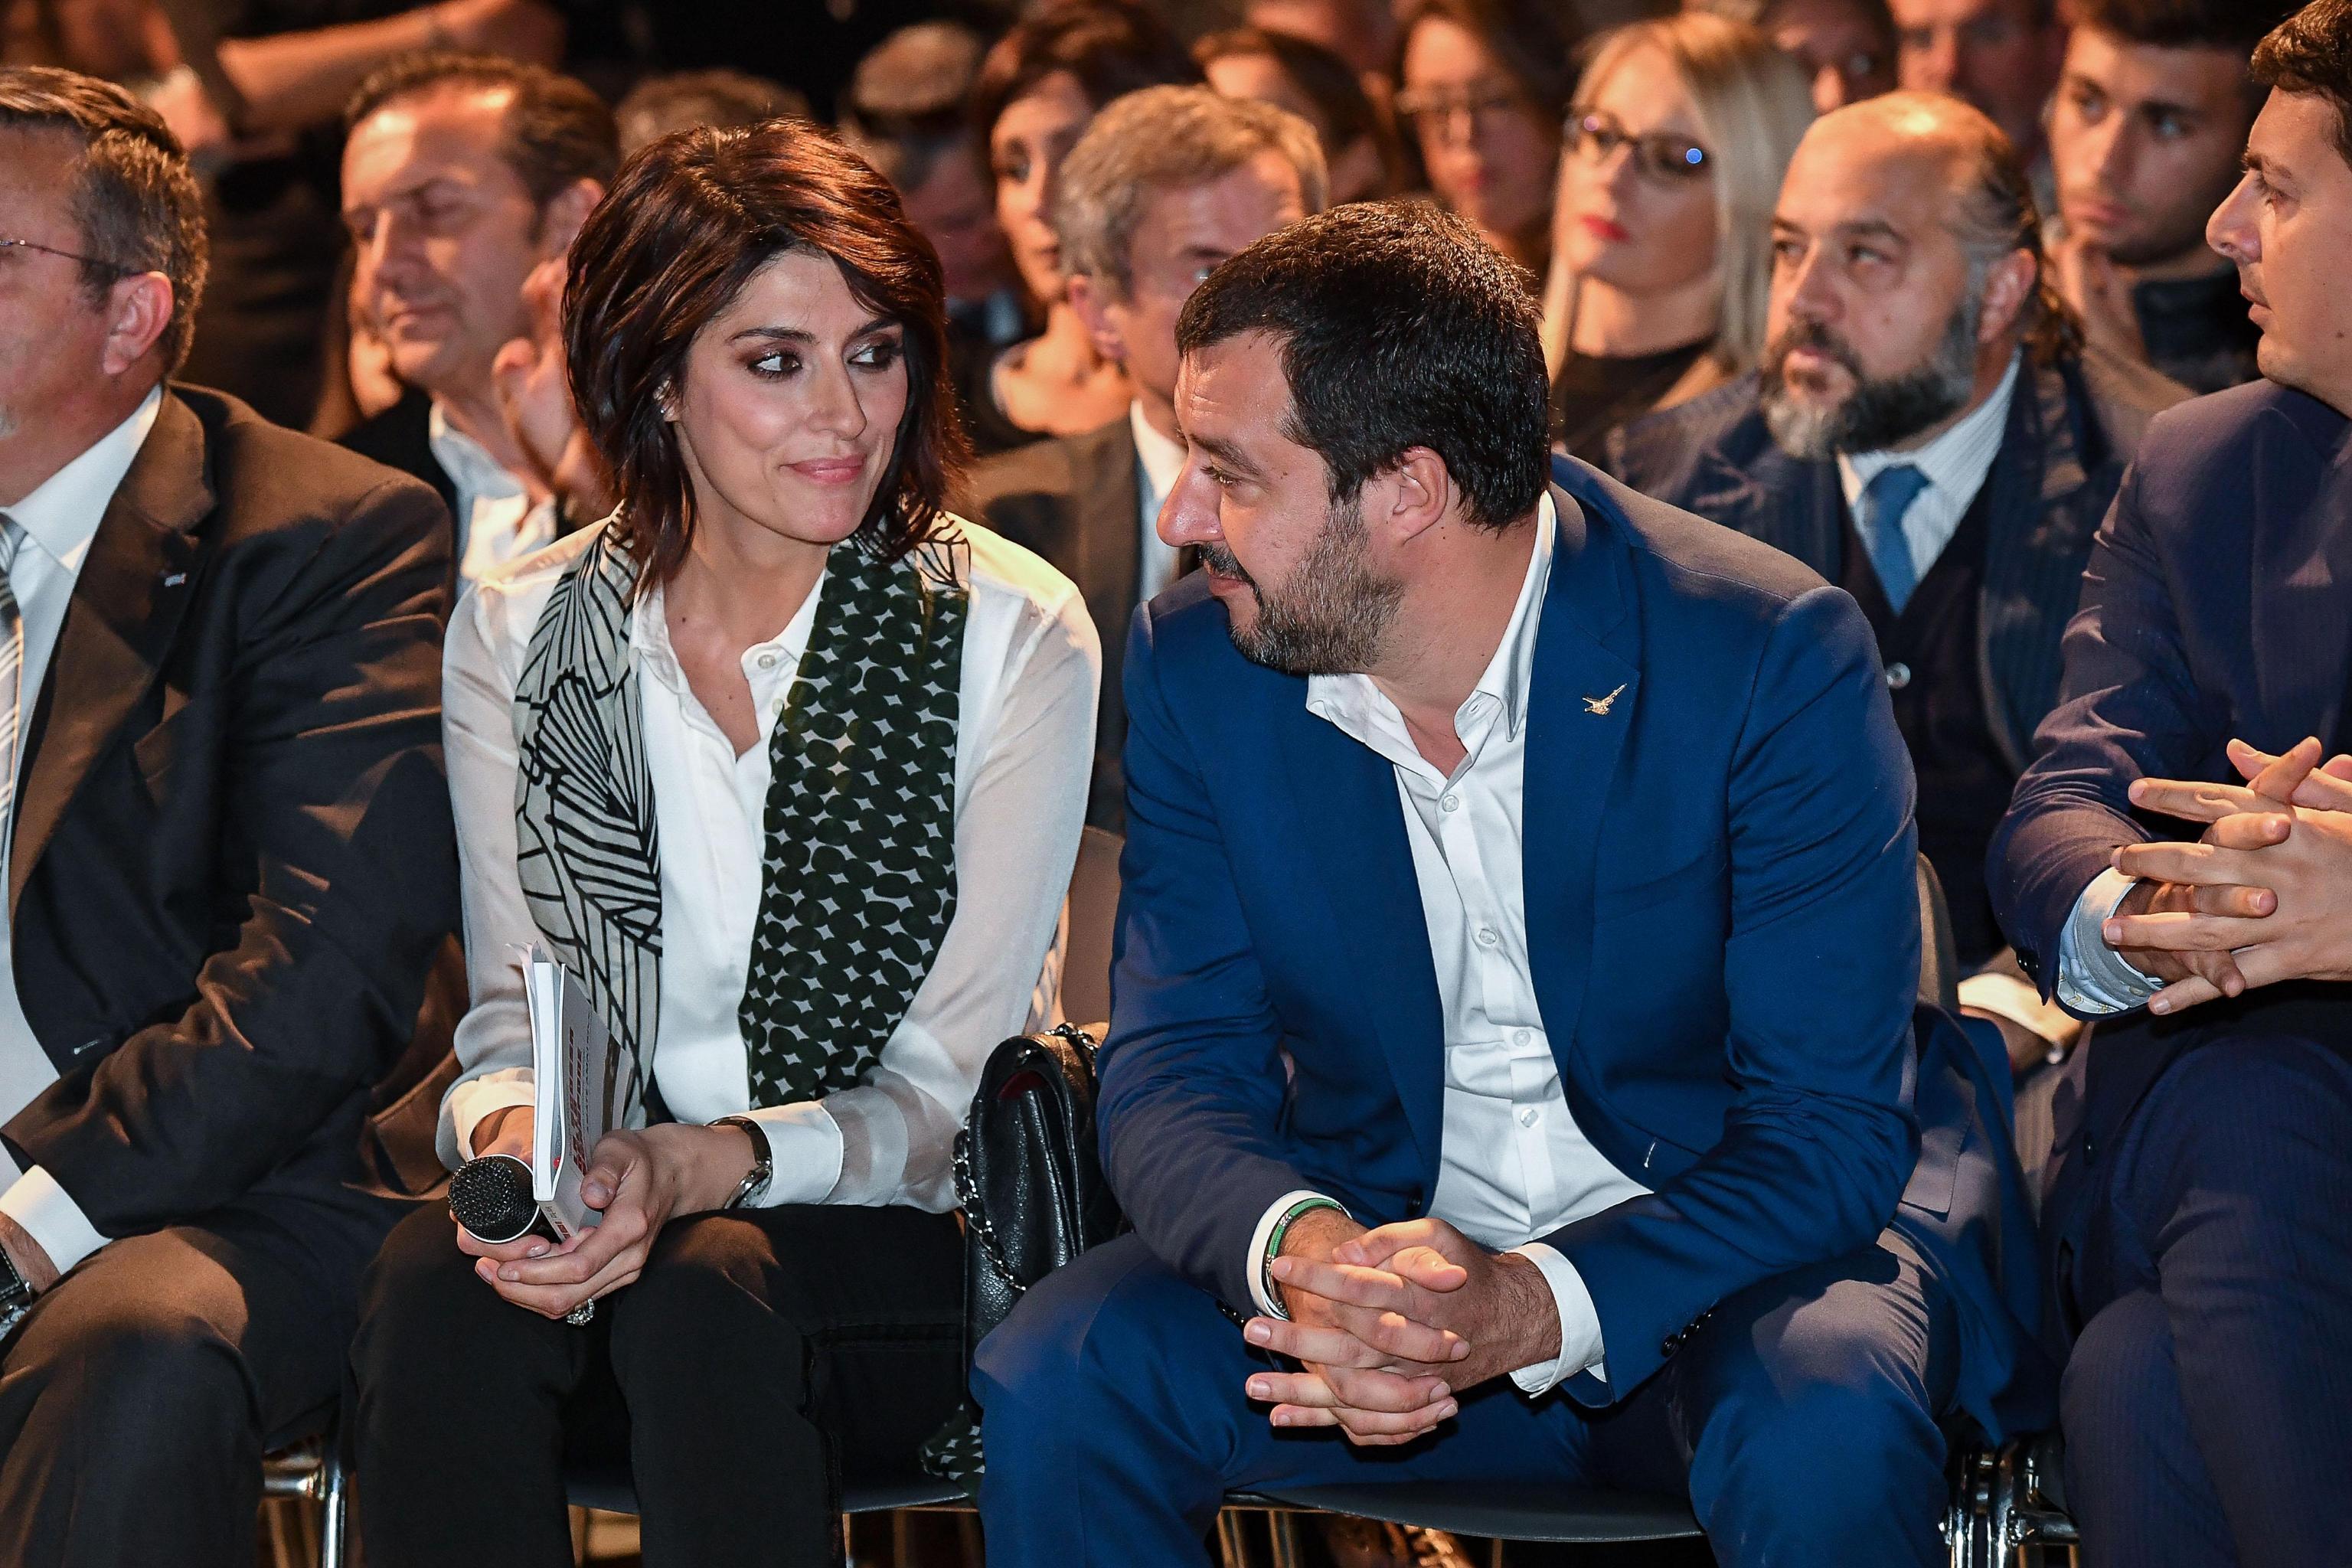 Elisa Isoardi: 'Matrimonio con Matteo Salvini? Se lui me lo chiede…'